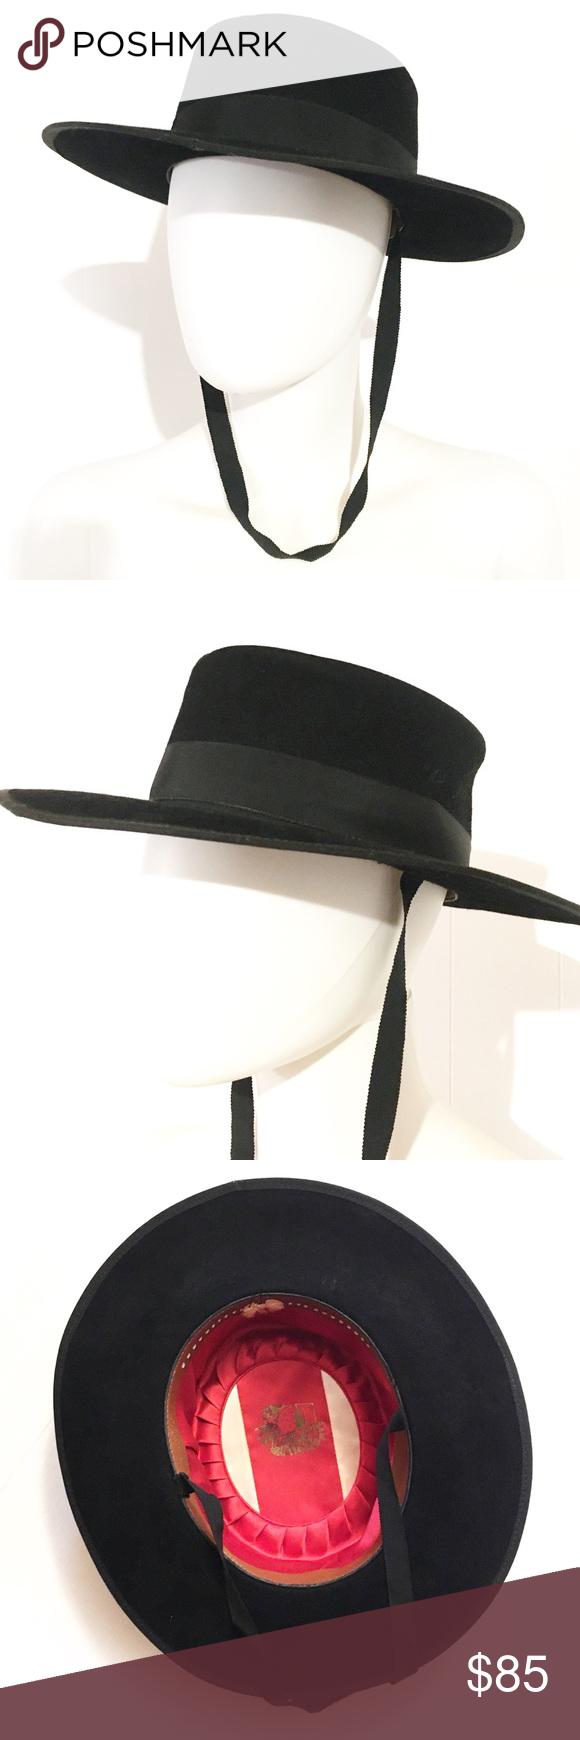 Vtg Bolero Or Gaucho Hat Spanish Boho Rocker Hat The Bolero Or Gaucho Or Portuguese Riding Hat Is A Handmade Spanish Style Flat Gaucho Bolero Hats Vintage